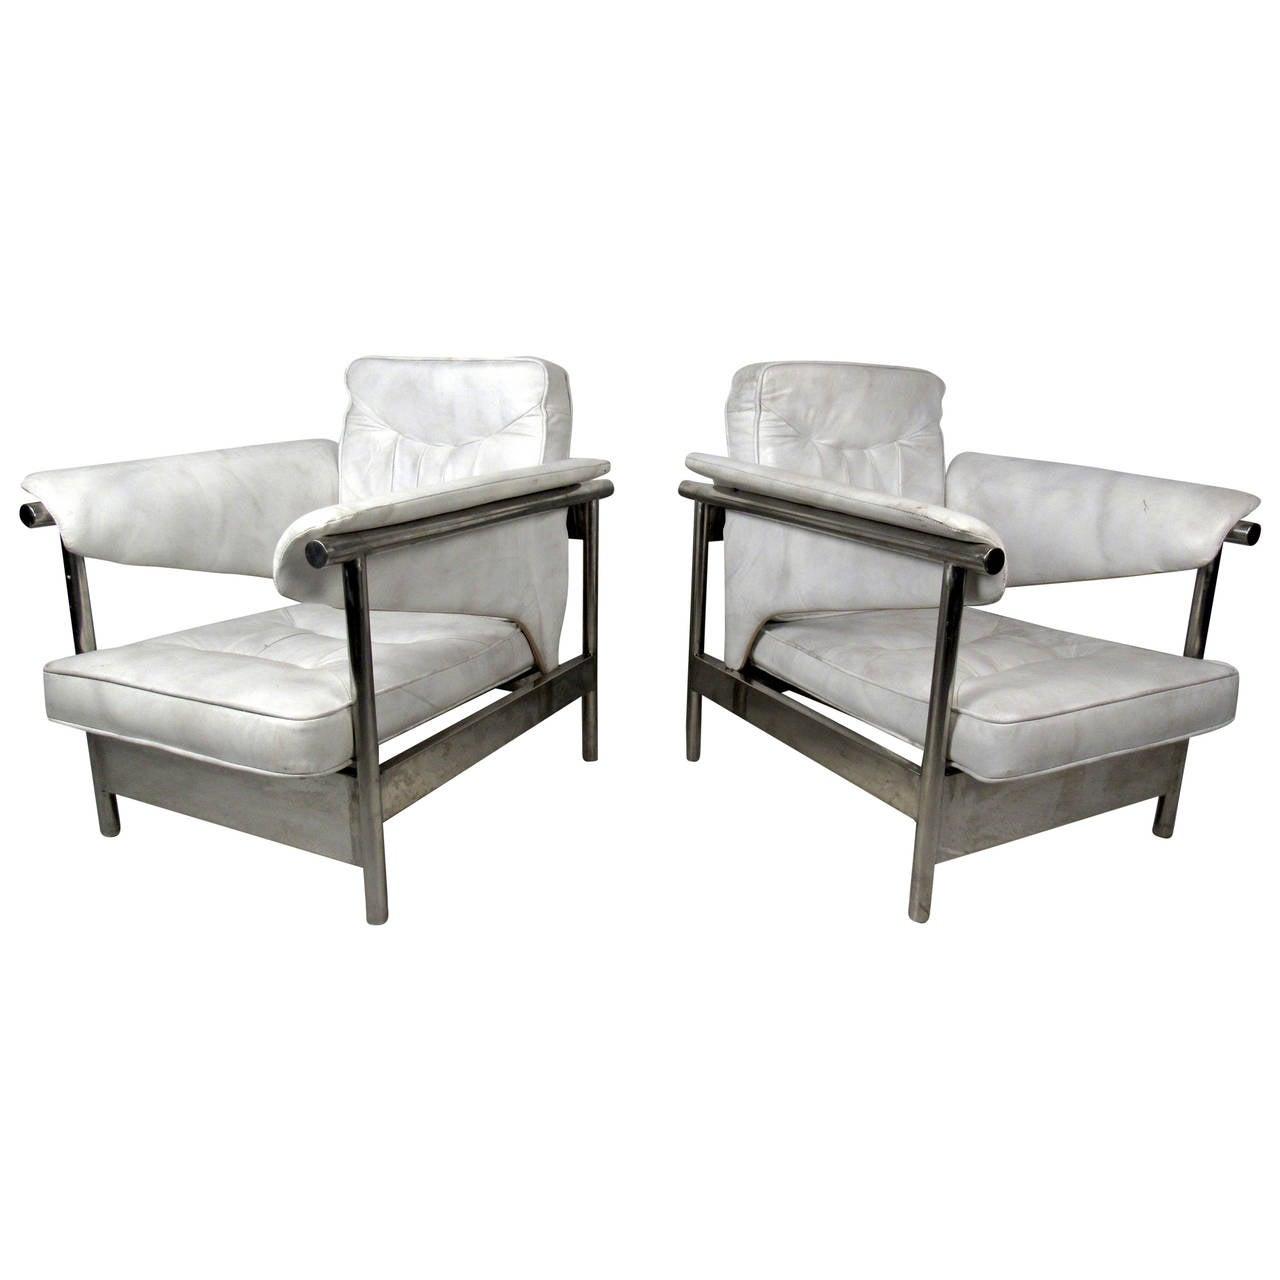 Midcentury Chrome Lounge Chairs